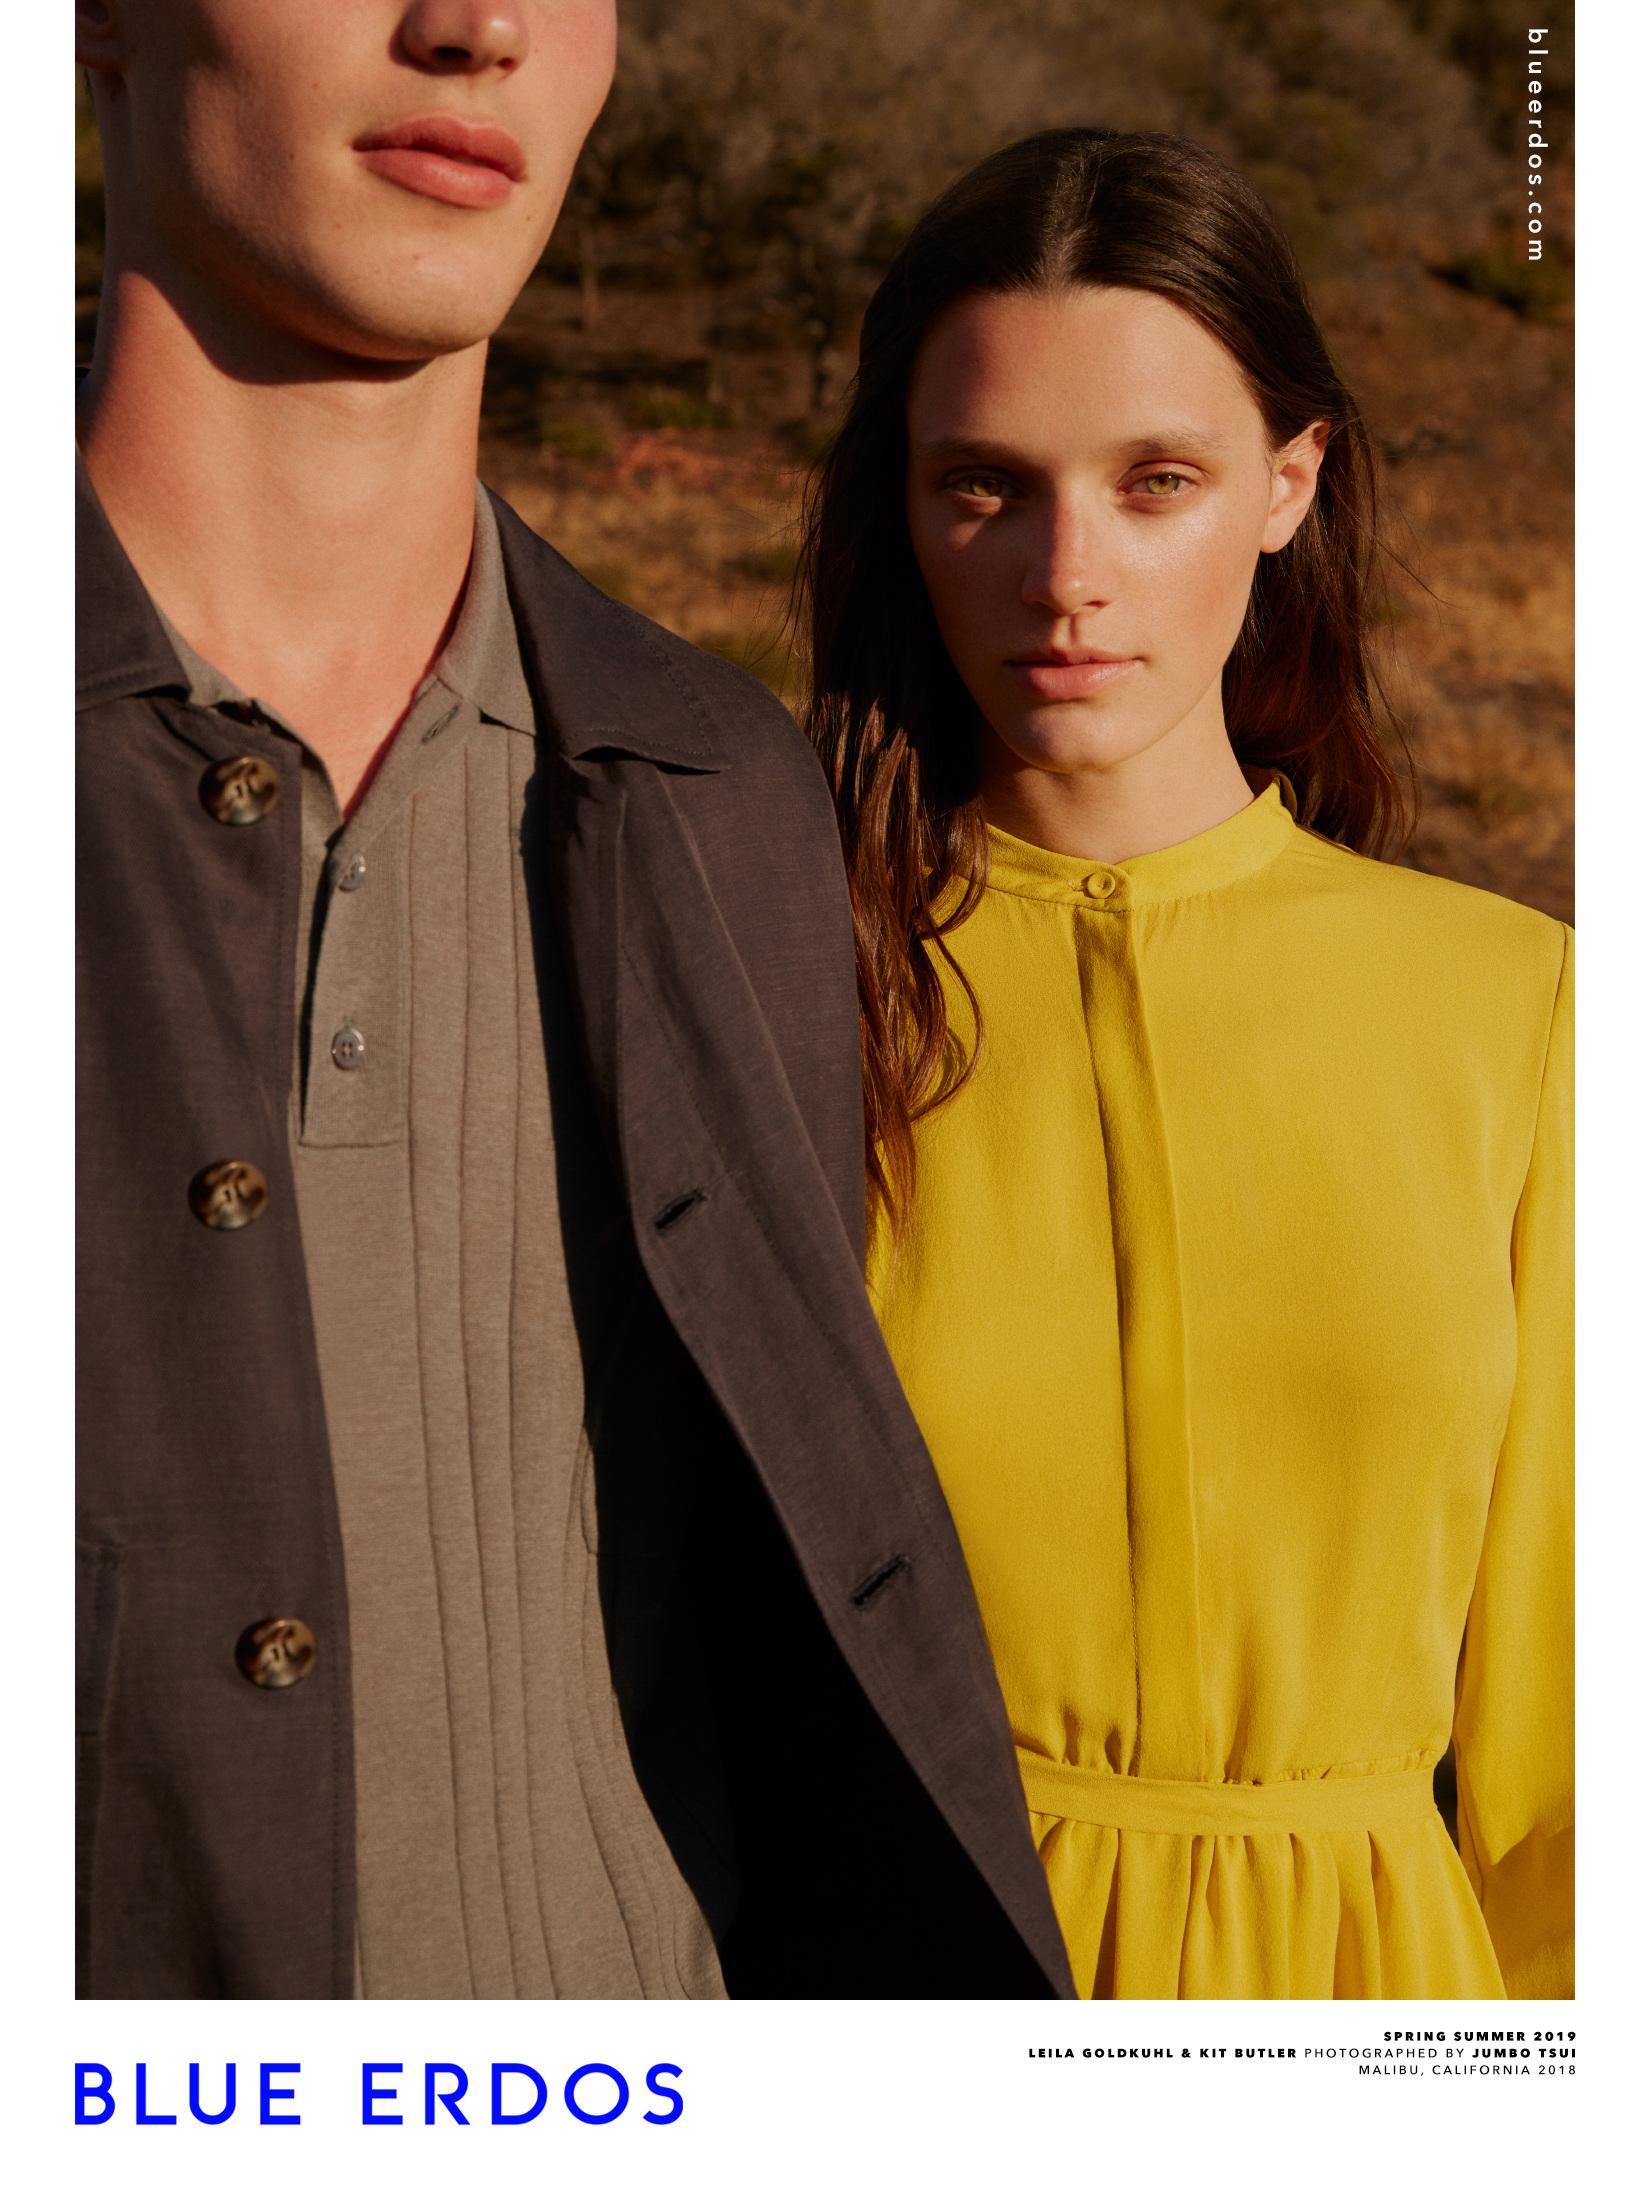 BLUE ERDOS S/S 2019 Campaign - Jumbo Photographe | Fashion Photography